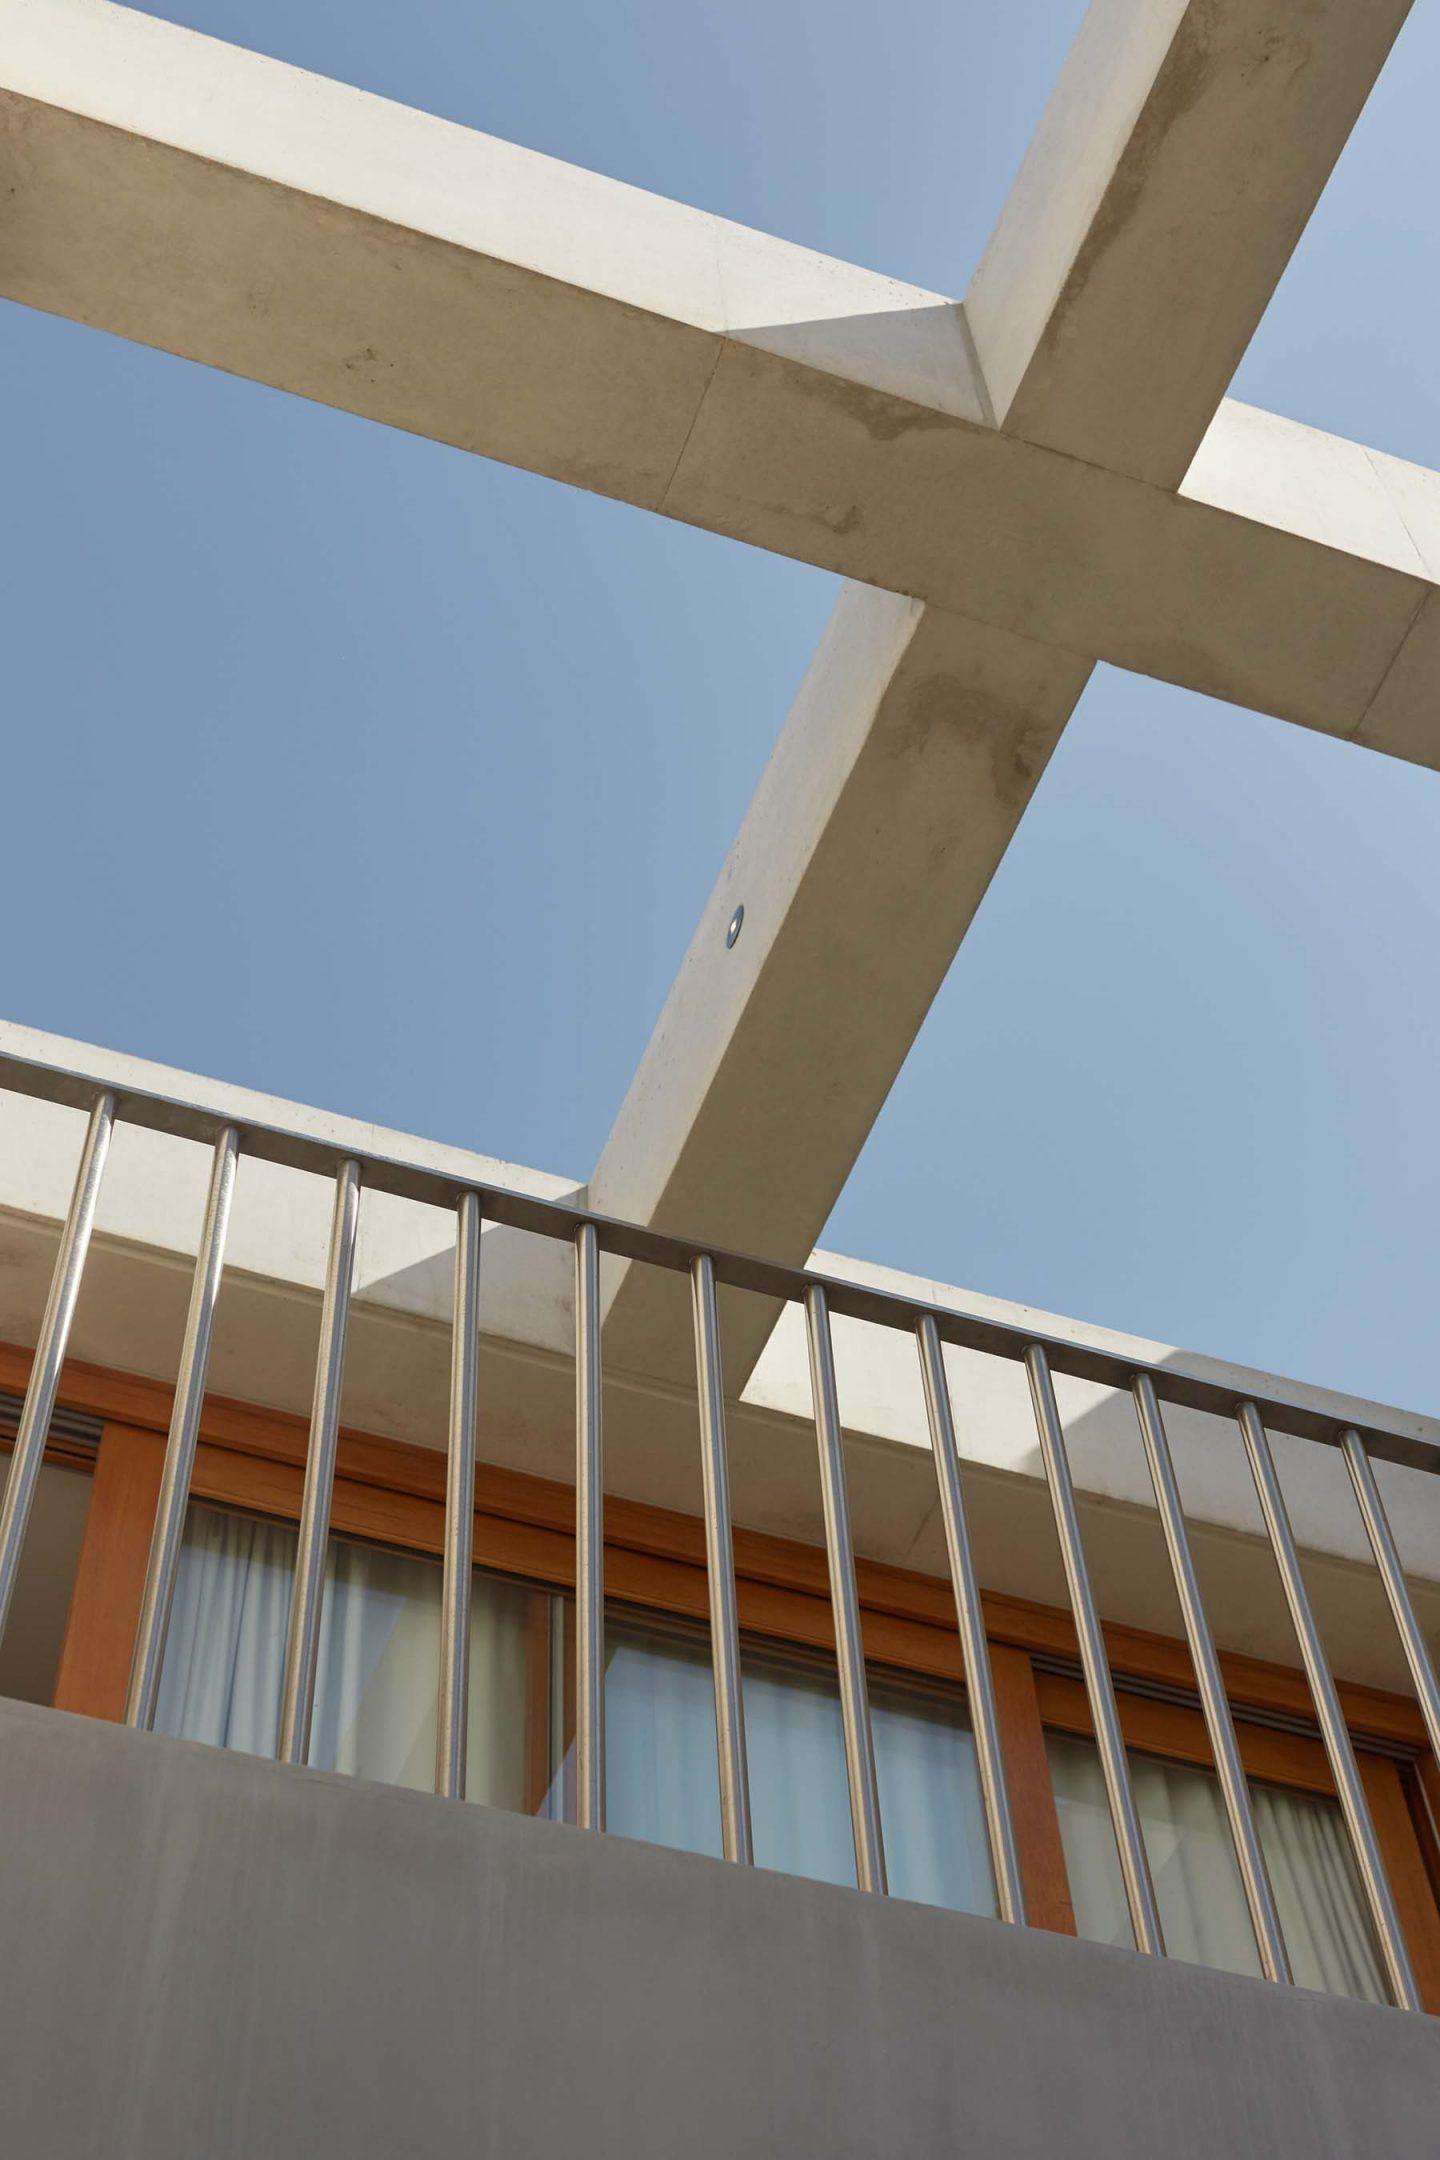 IGNANT-Architecture-Oliver-du-Puy-Architects-Skinny-House-19